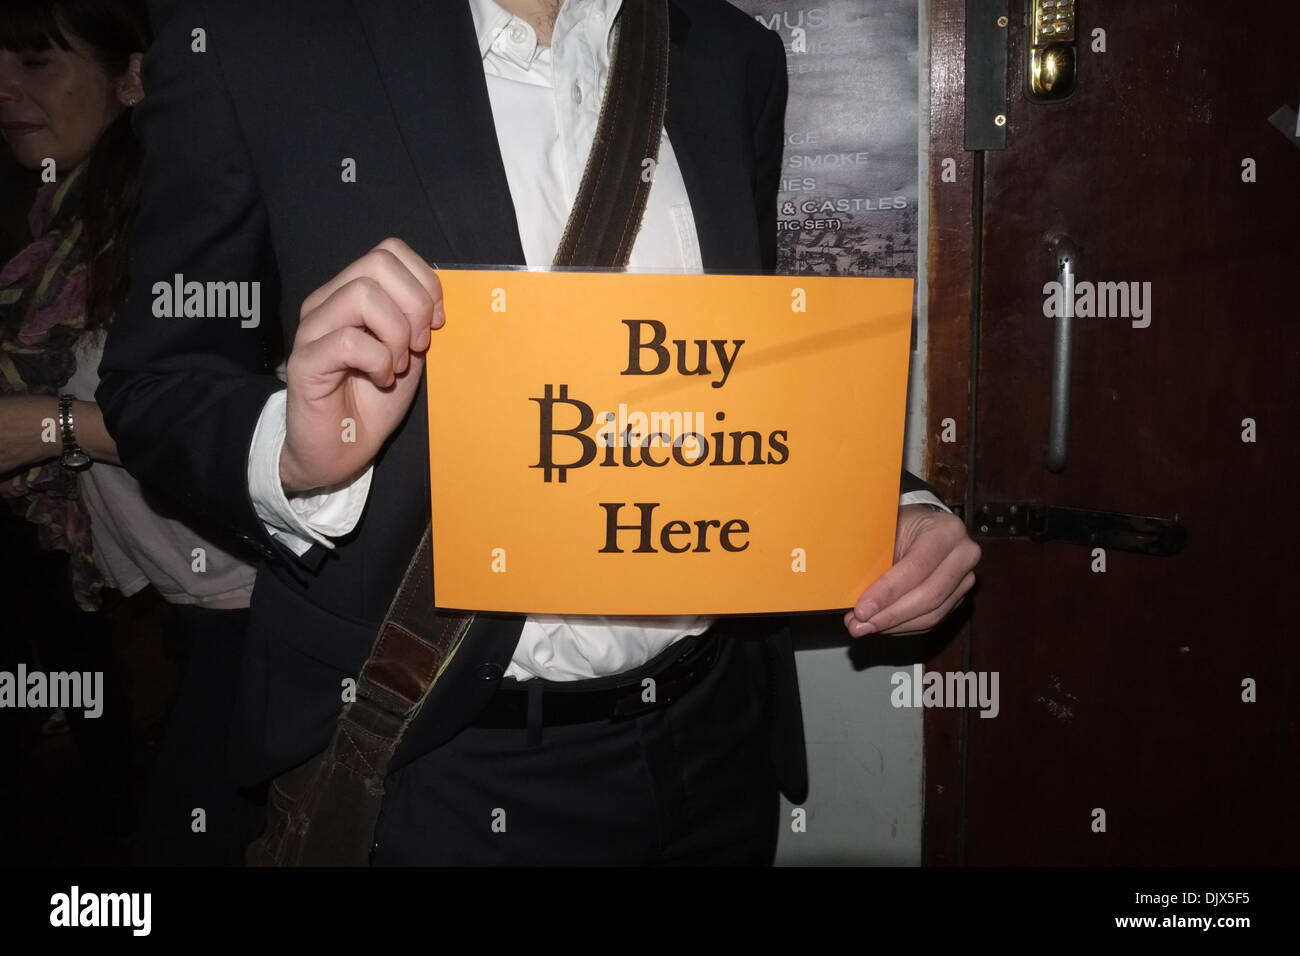 London uk 30th nov 2013 bitcoin and cryptocurrency enthusiasts london uk 30th nov 2013 bitcoin and cryptocurrency enthusiasts and experts meet in london credit rachel megawhatalamy live news ccuart Choice Image